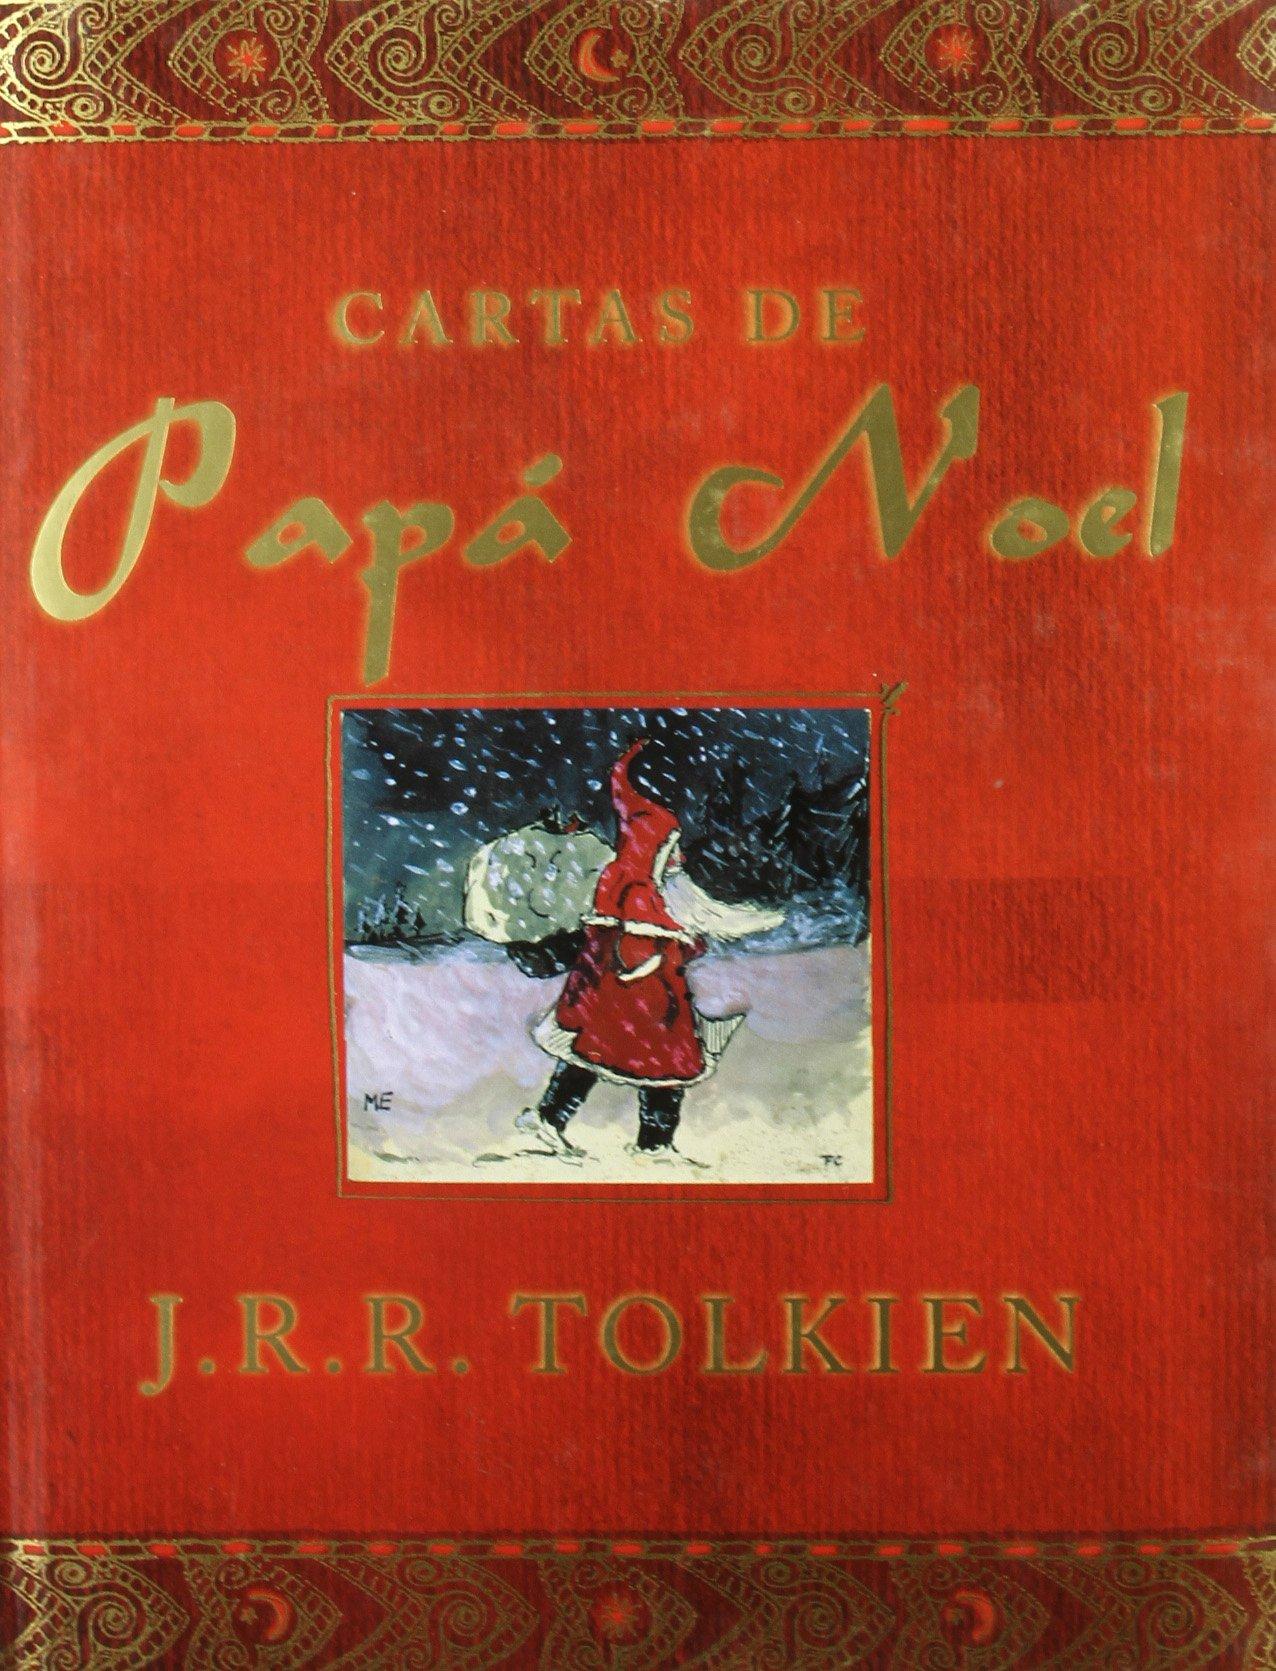 Cartas de Papá Noel: J.R.R. Tolkien: 9788476697610: Amazon ...